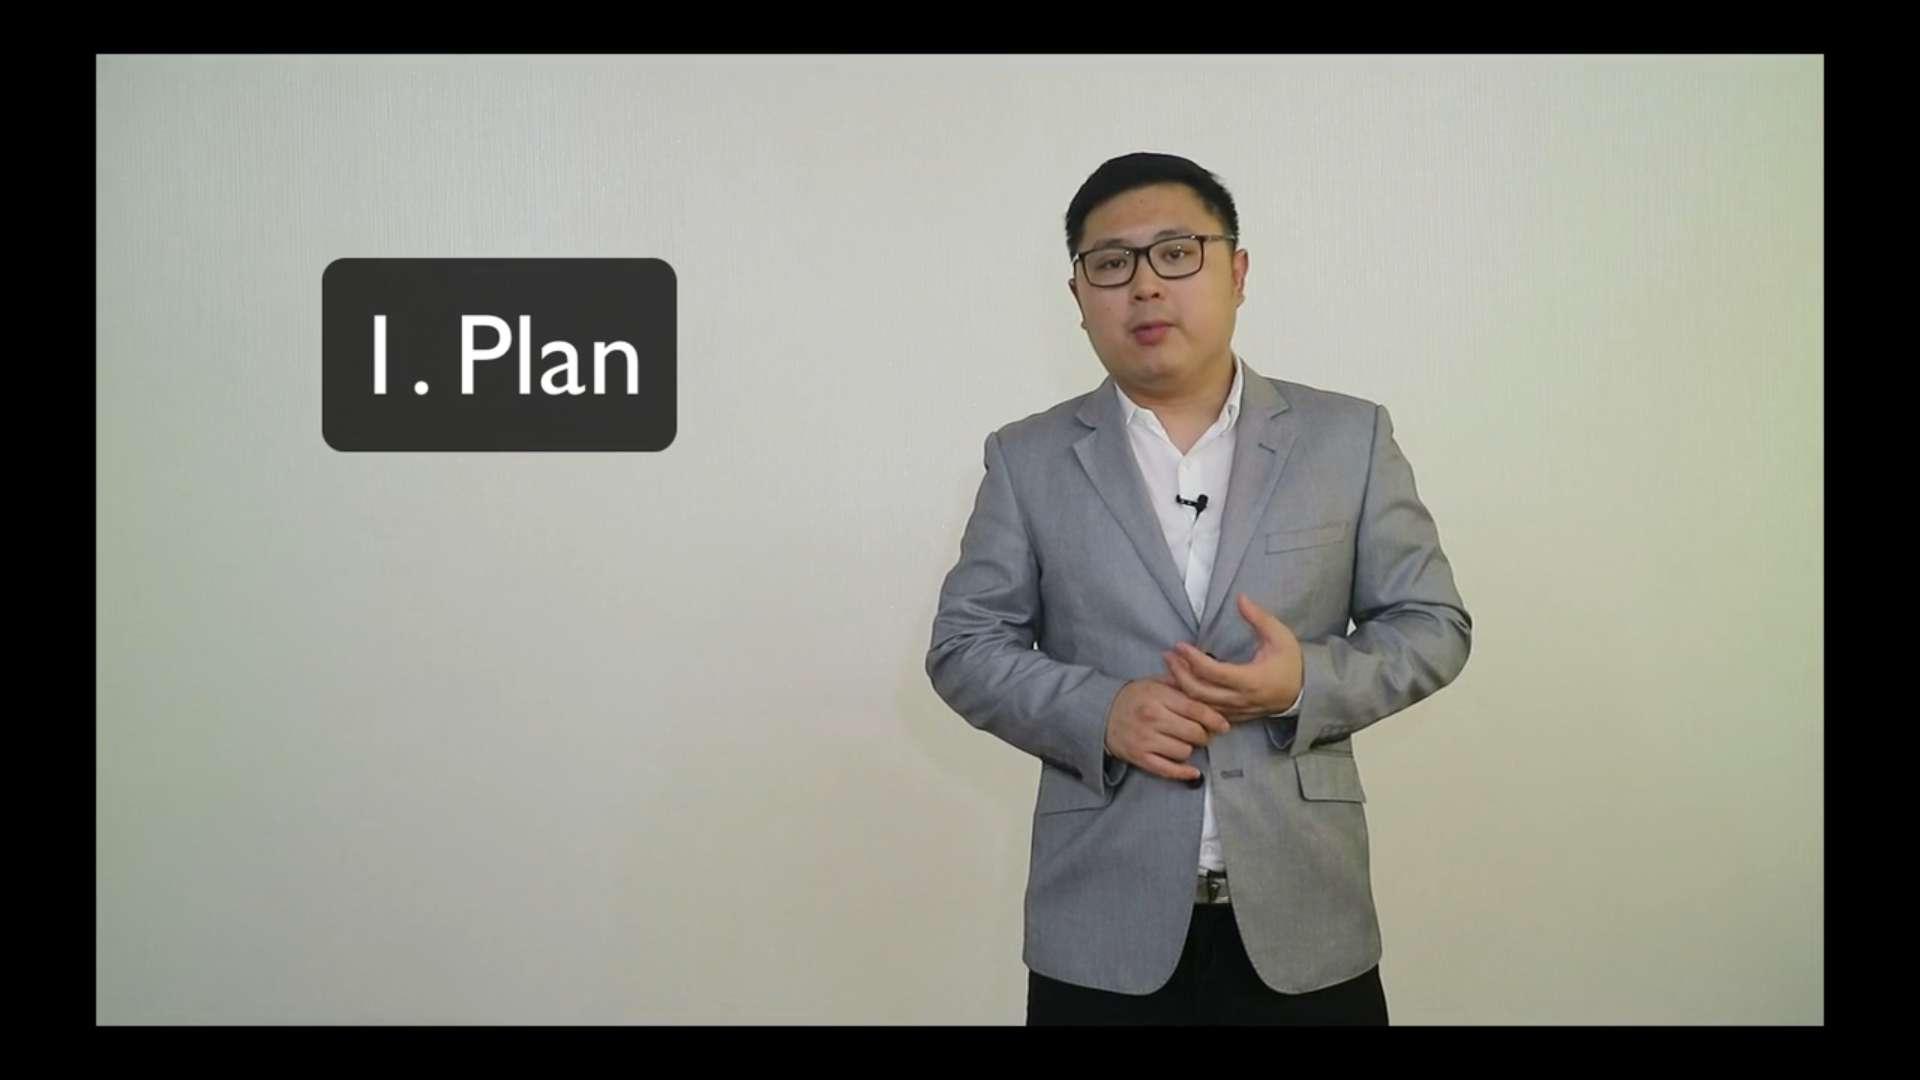 6. Plan for Presentation